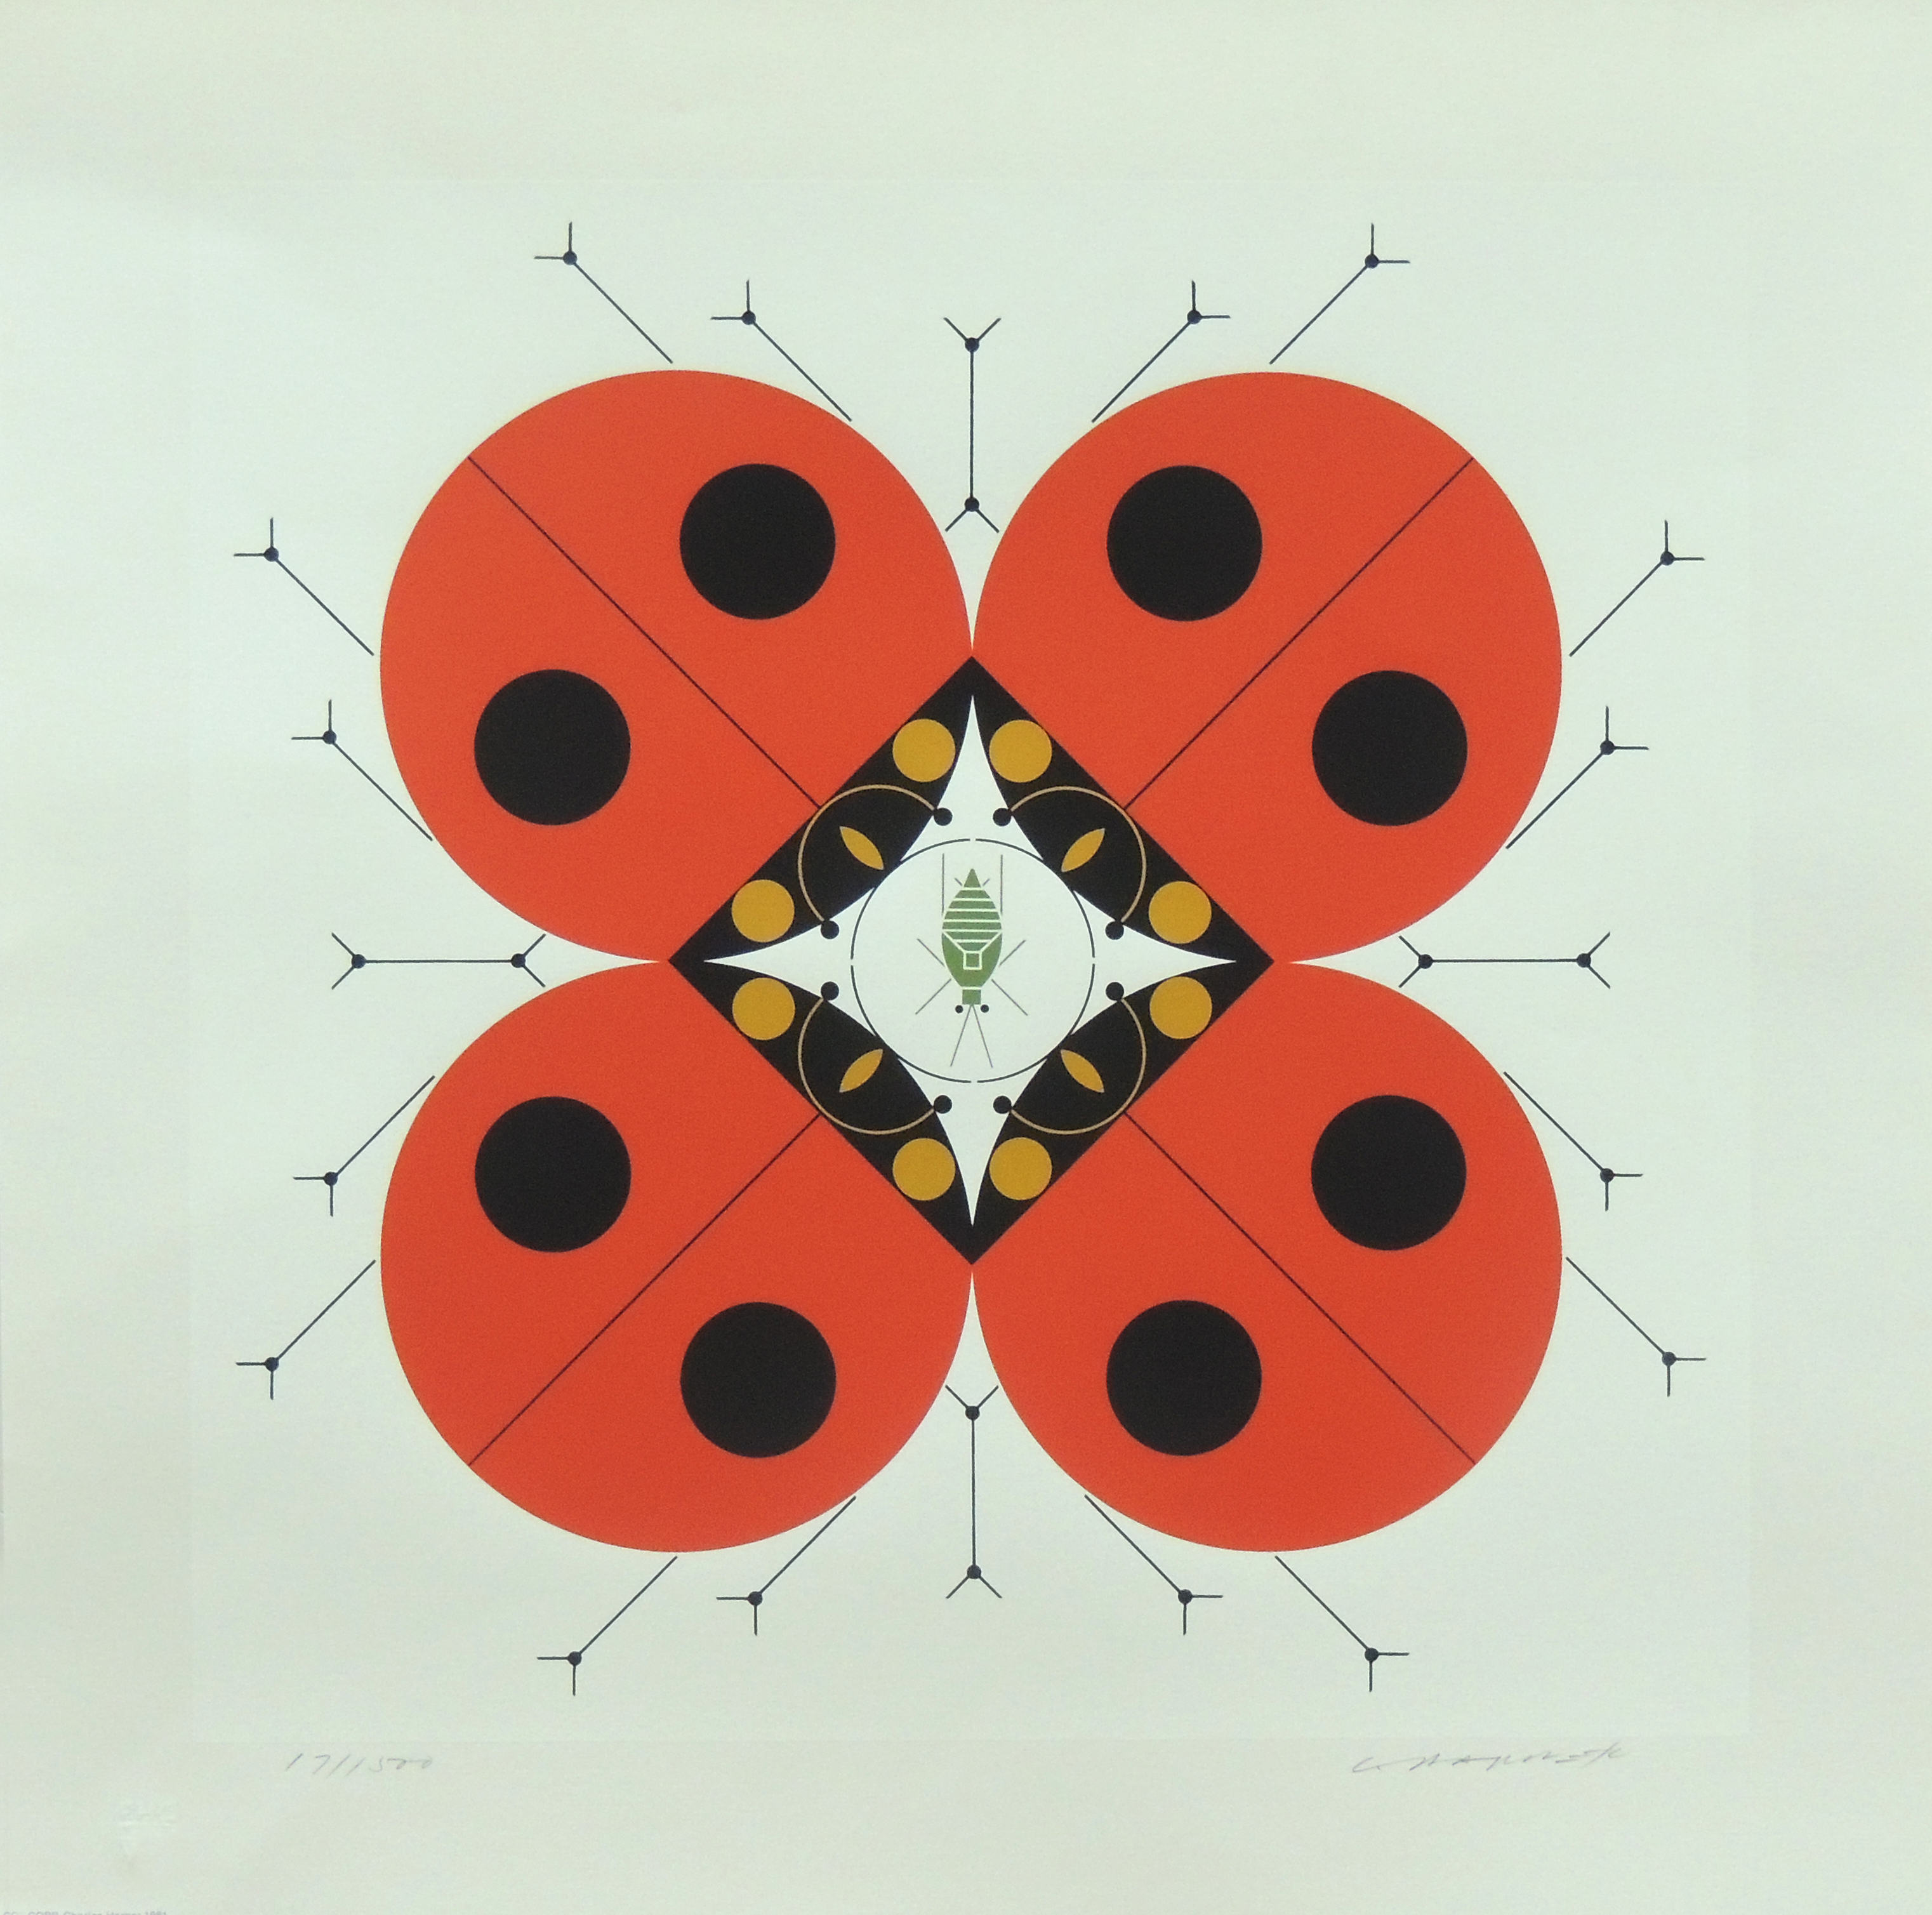 "1984.048 | Charles Harper | LAST APHID | serigraph on paper | 15-1/2 x 15-1/2"" | 1981 | Gift of Mr. Kenneth C. Tregilus"